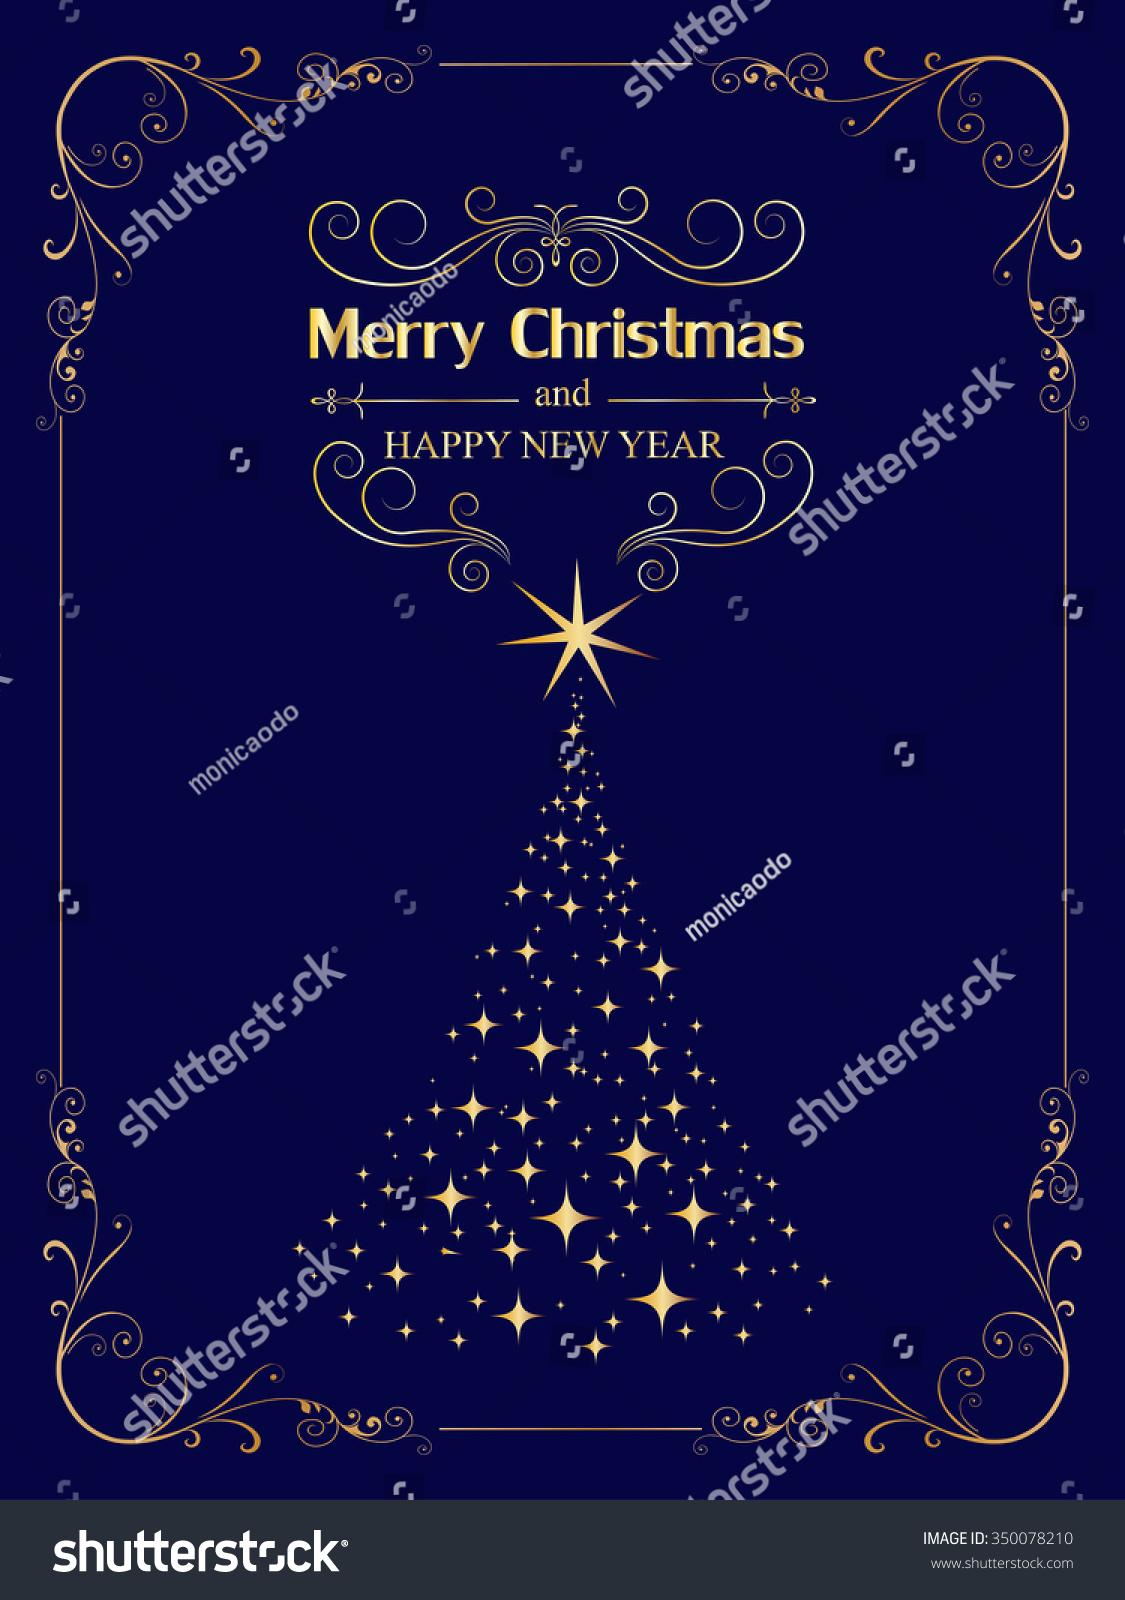 New Year Christmas Greetings Design Elegant Stock Vector Royalty